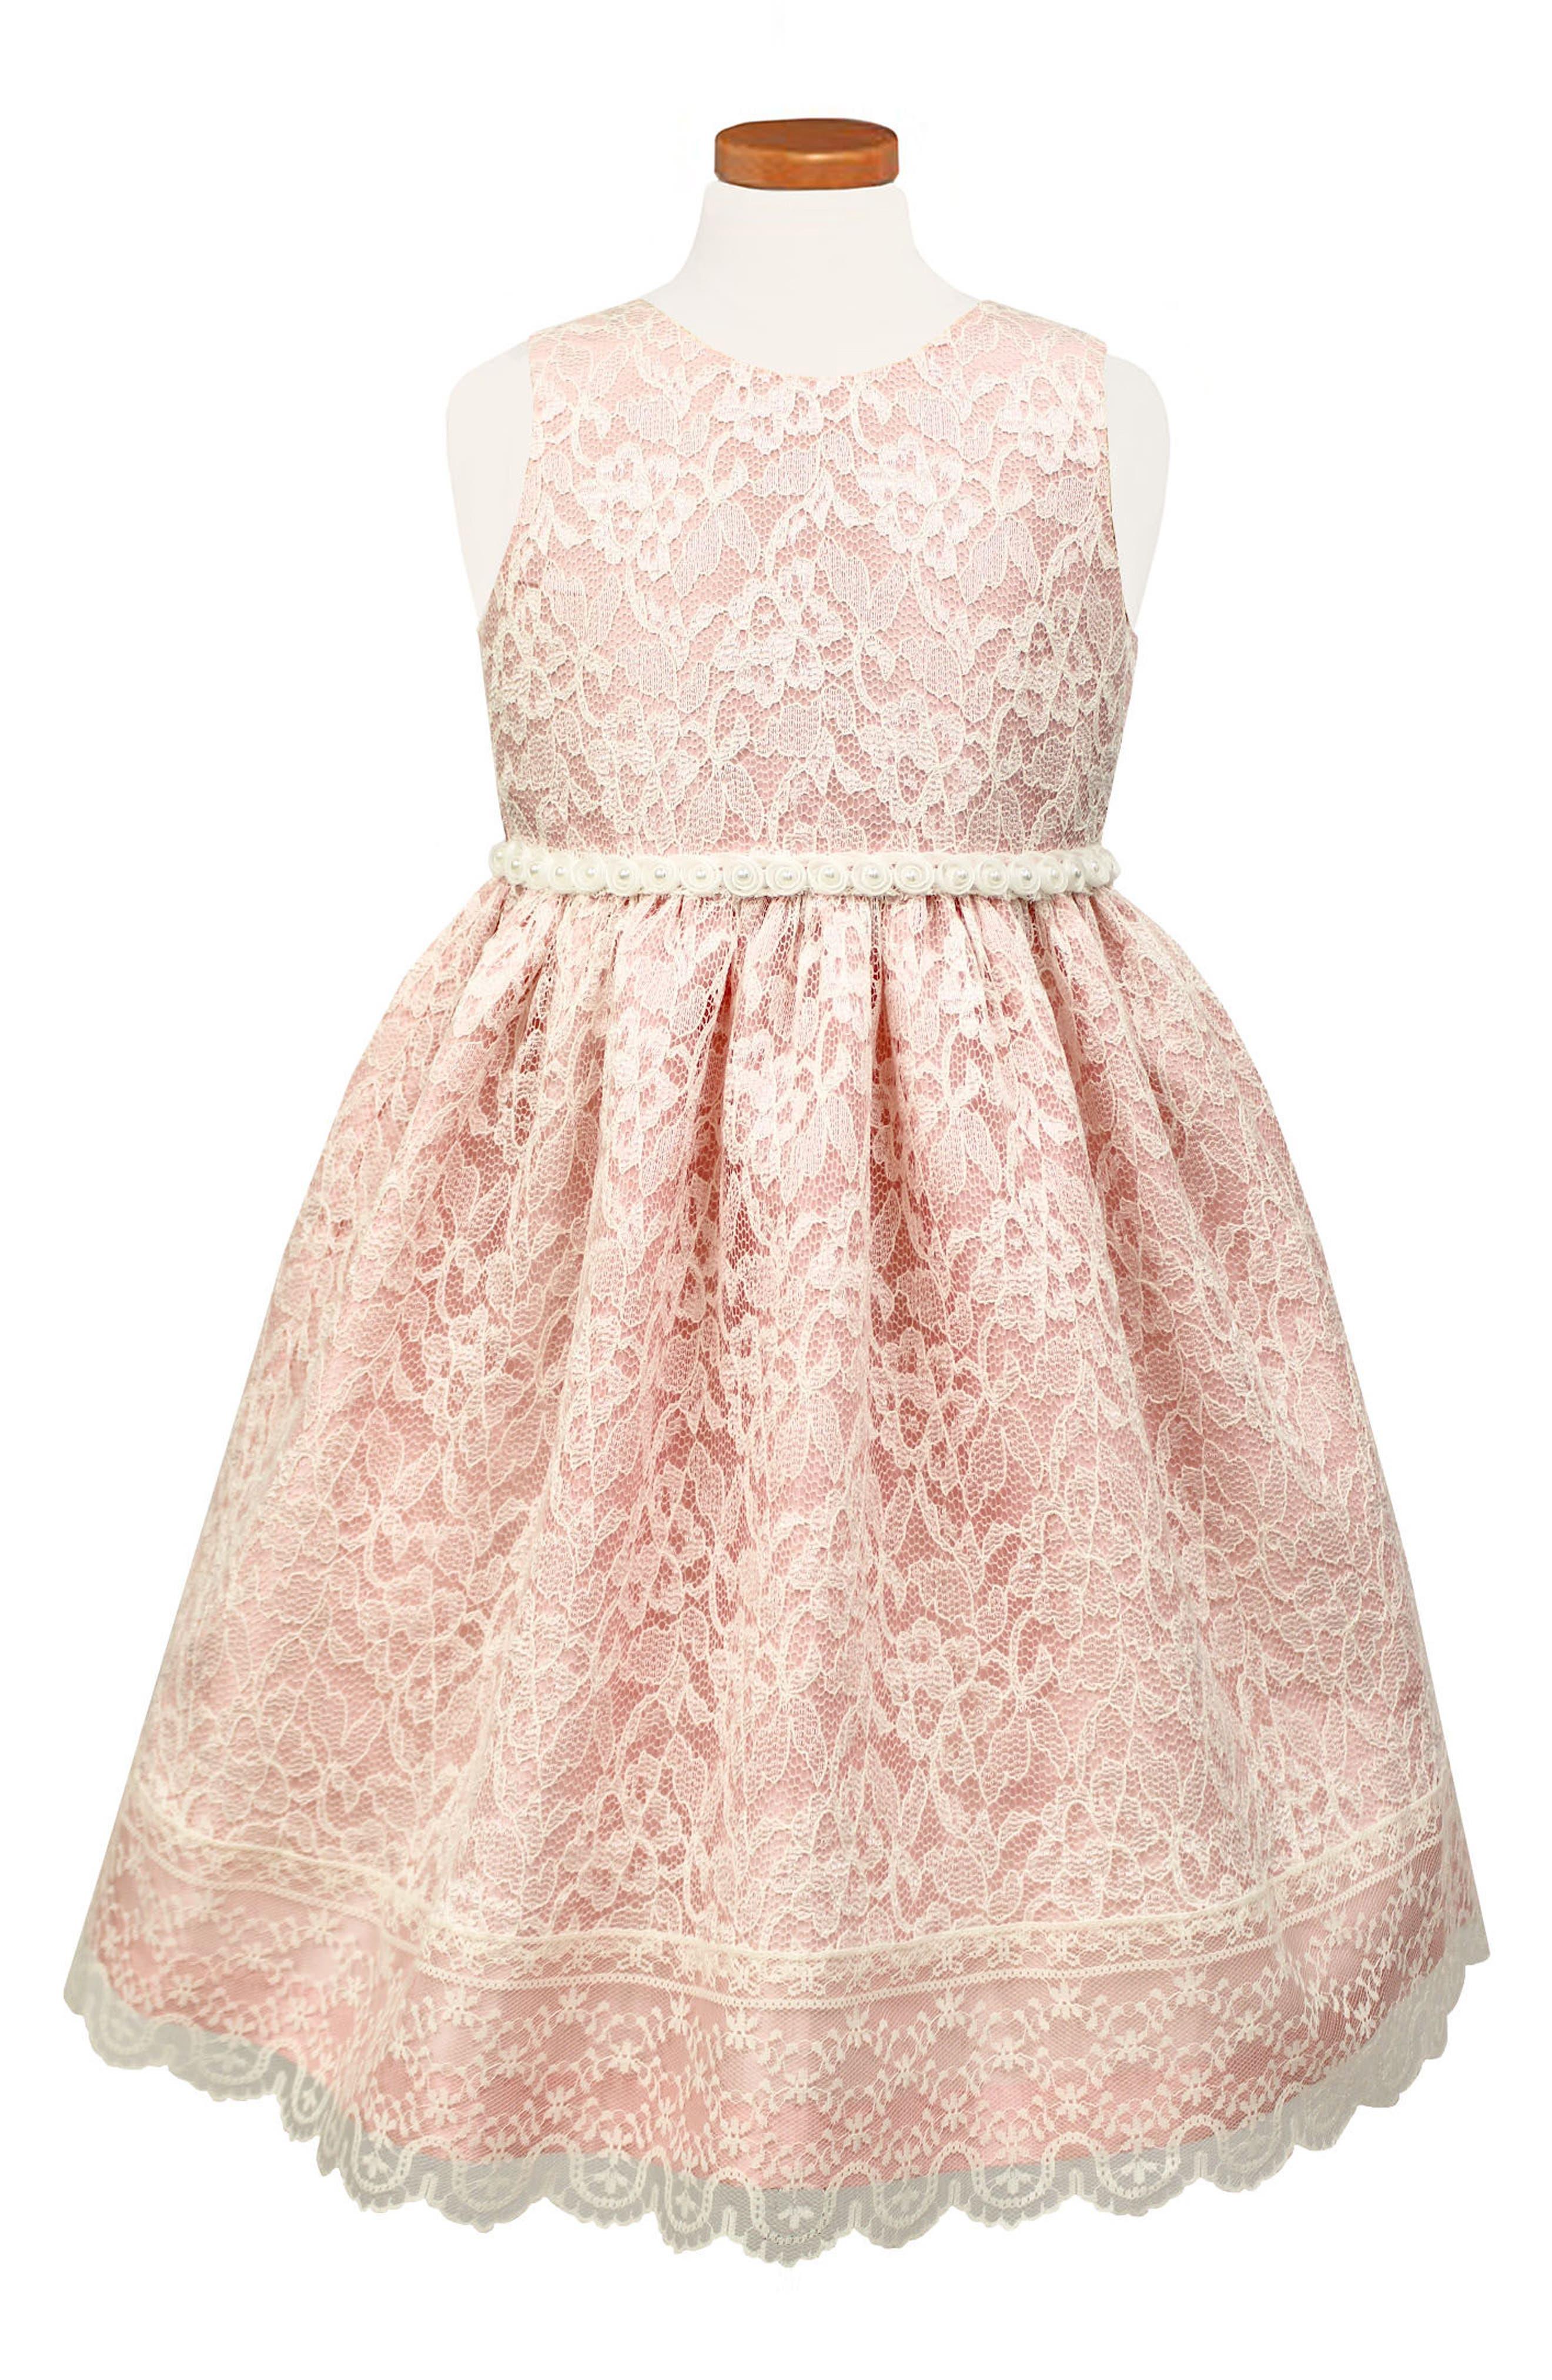 SORBET Sleeveless Lace Dress